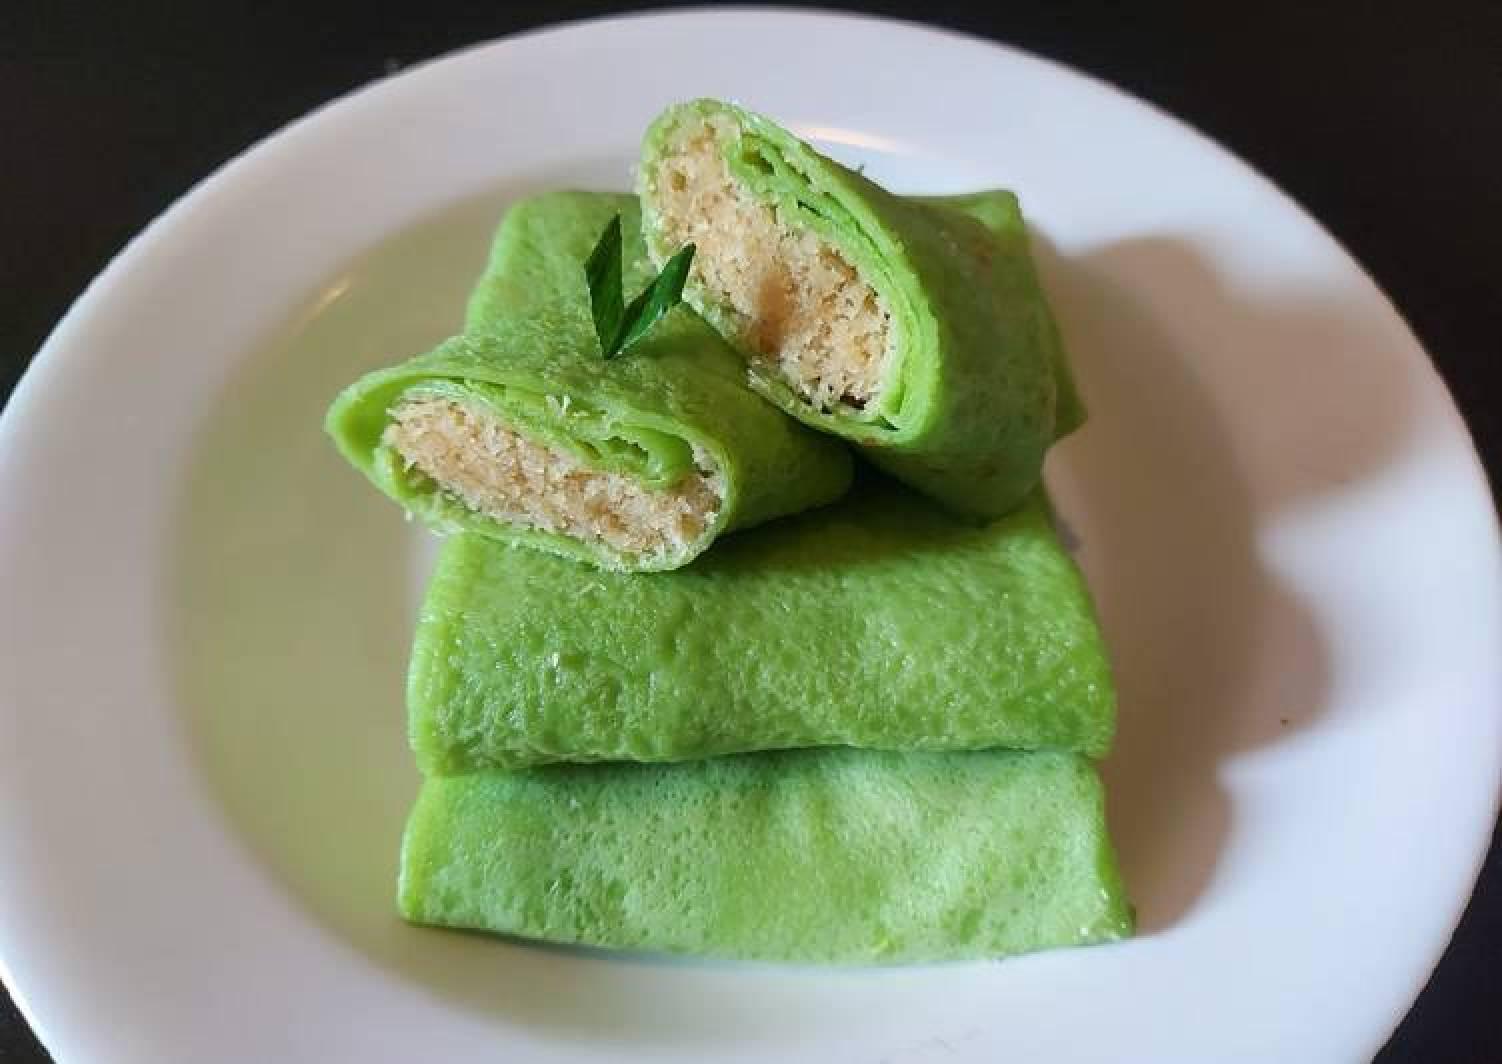 Resep Dadar Gulung Isi Kelapa Sempurna Best Recipes